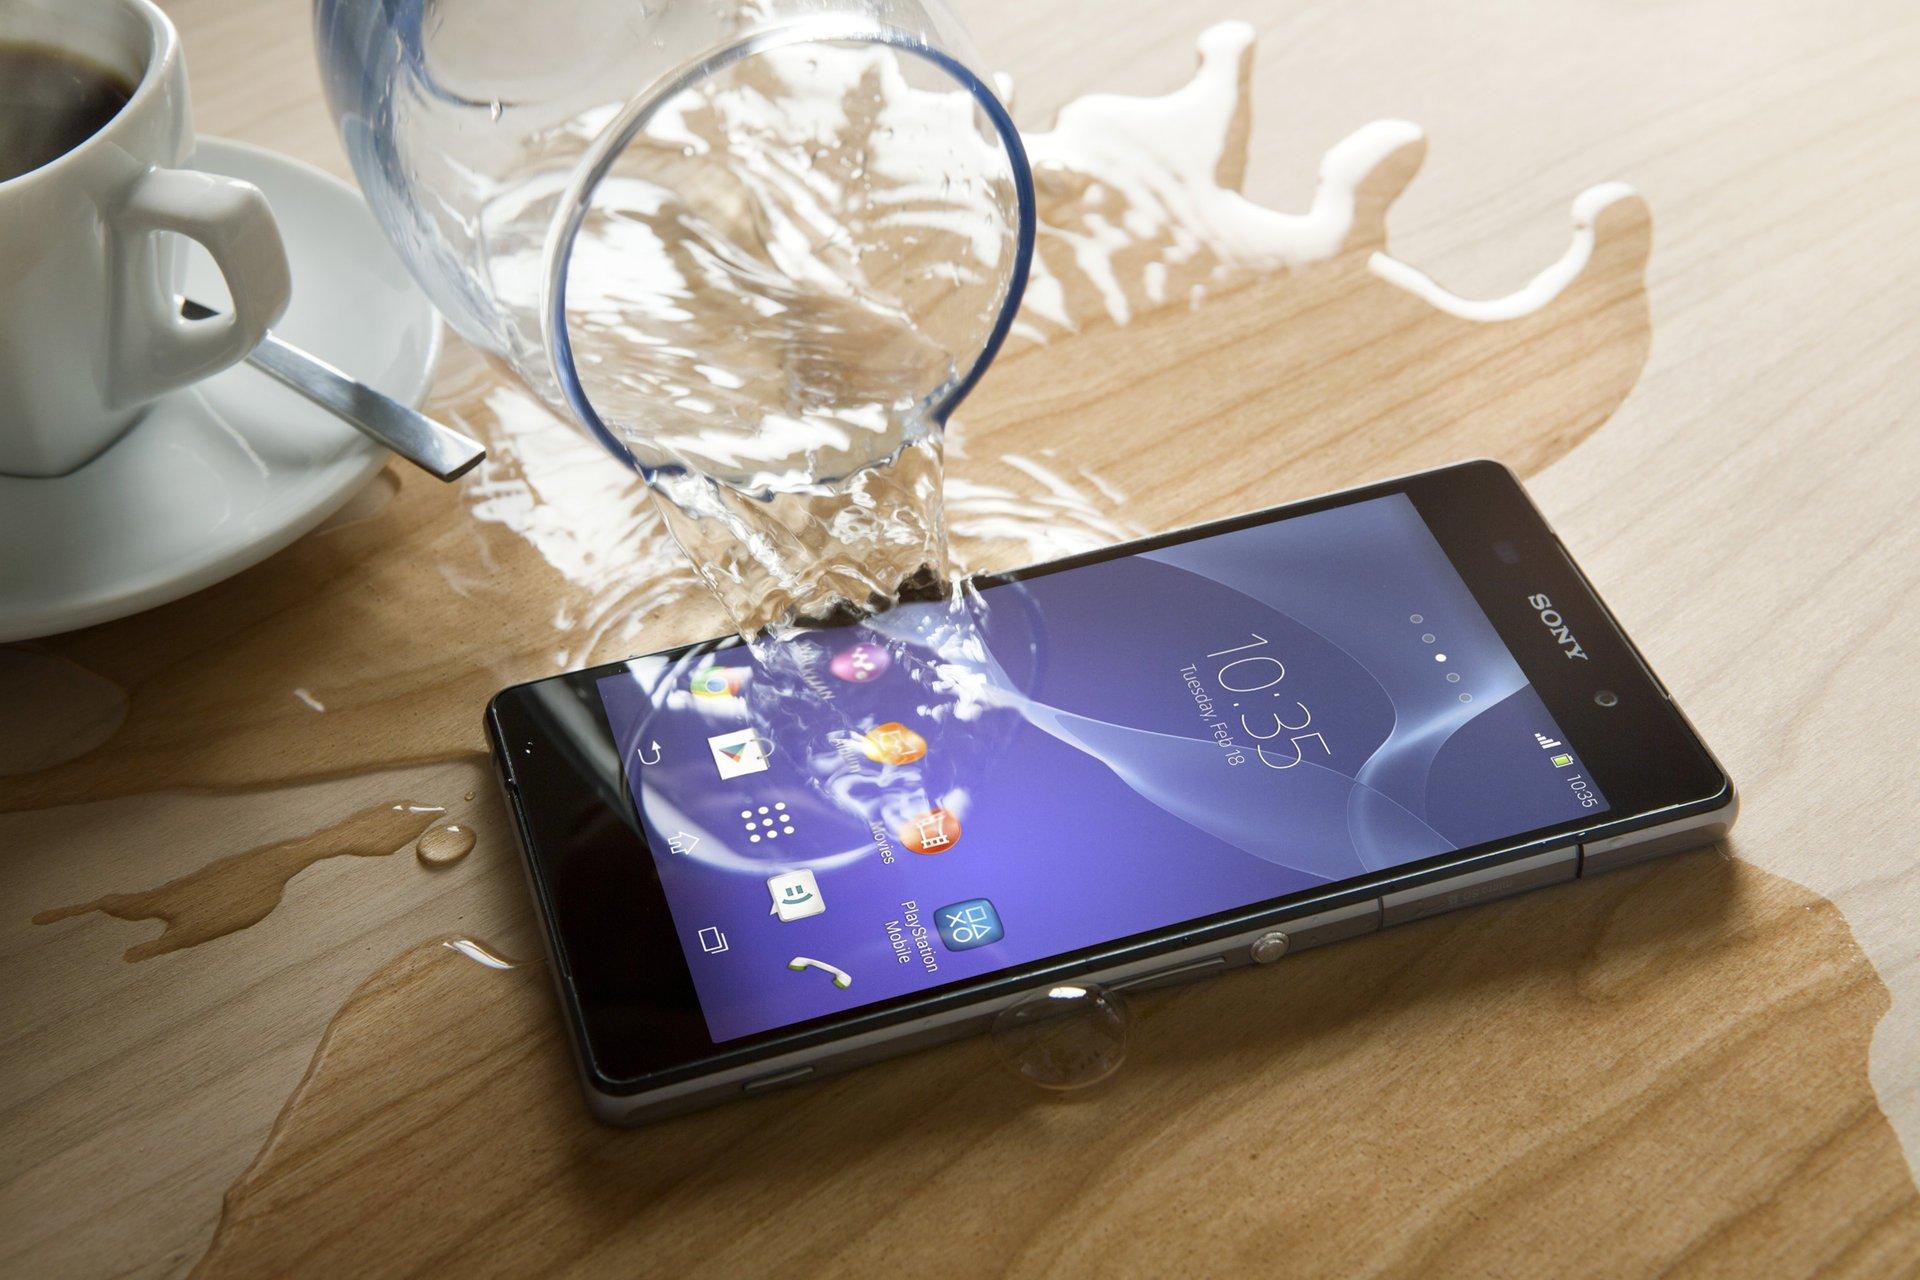 Sony xperia z1 как сделать фото экрана